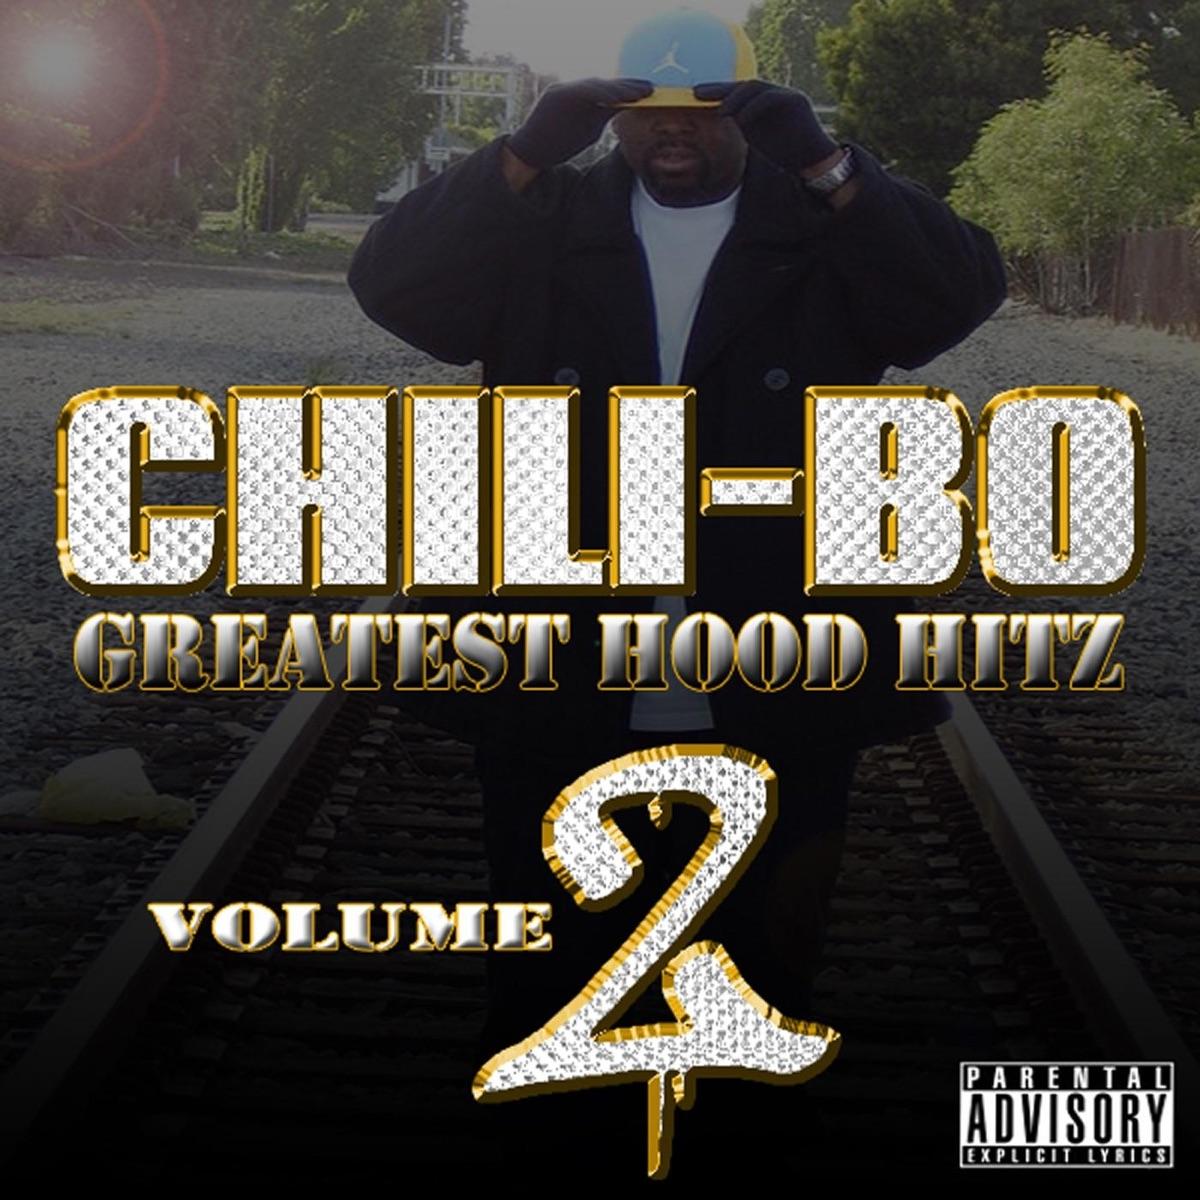 Greatest Hood Hitz Vol 2 Chili-Bo CD cover